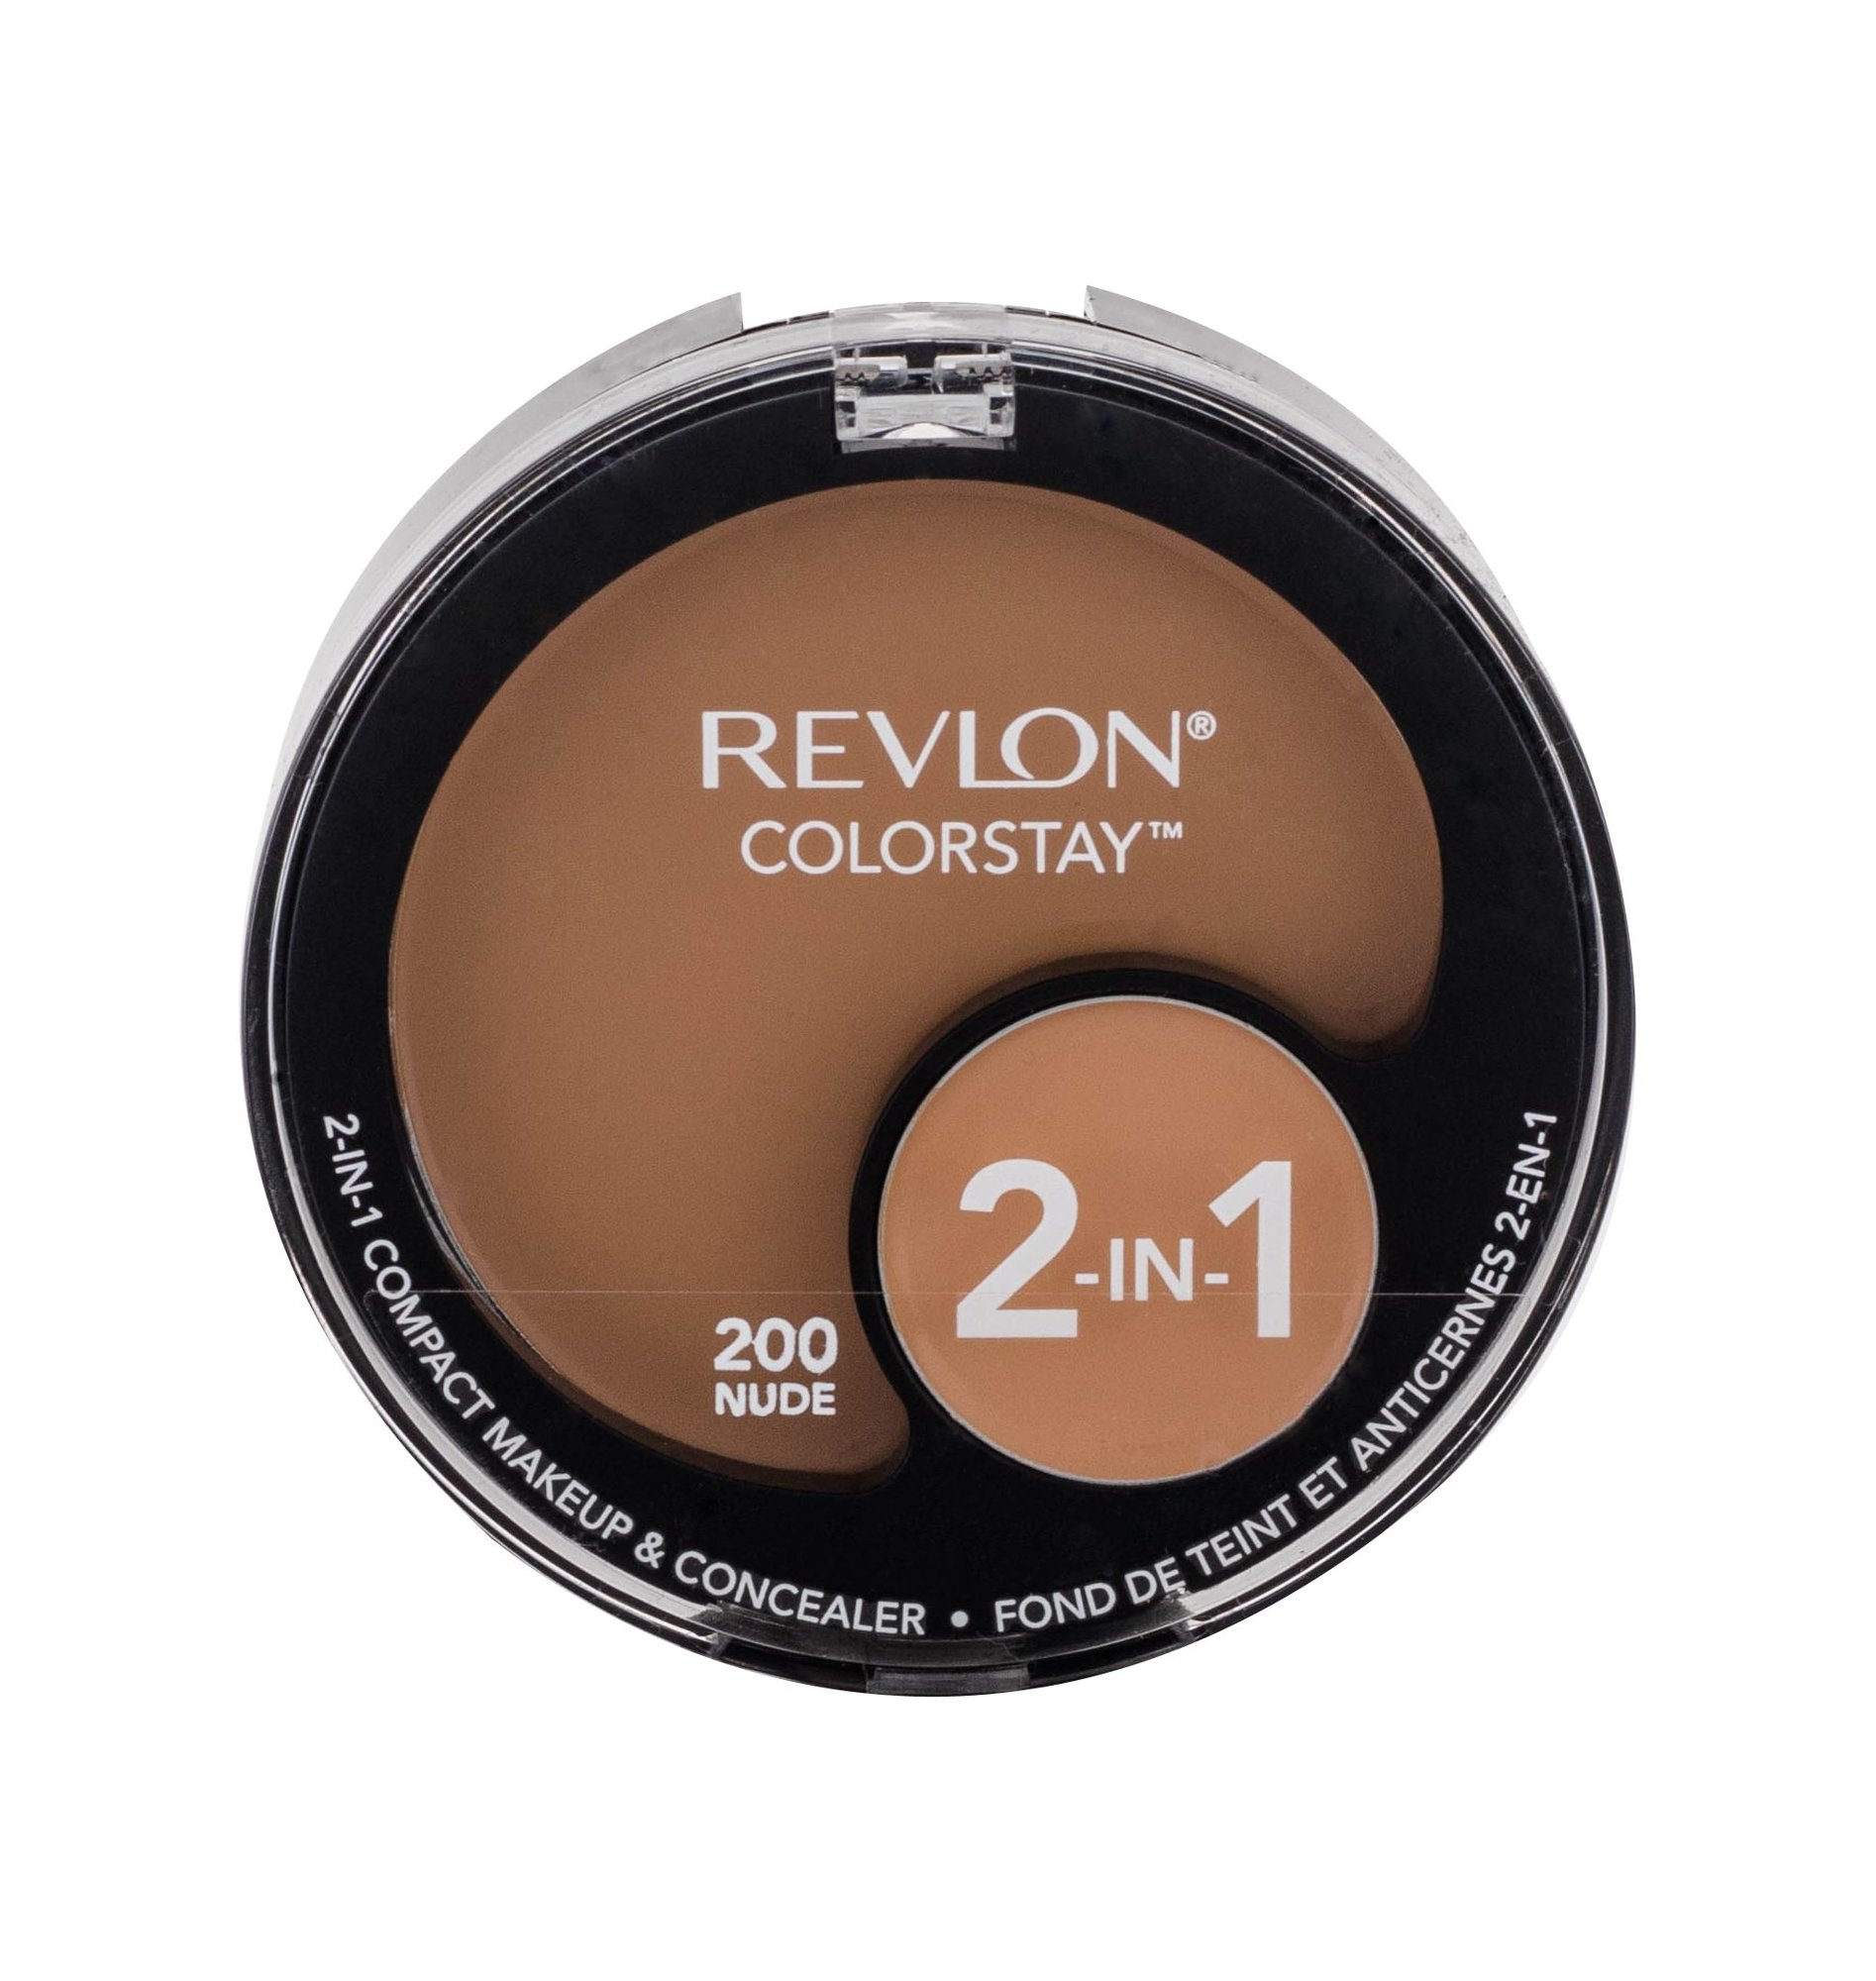 Revlon Colorstay Makeup 12,3ml 200 Nude